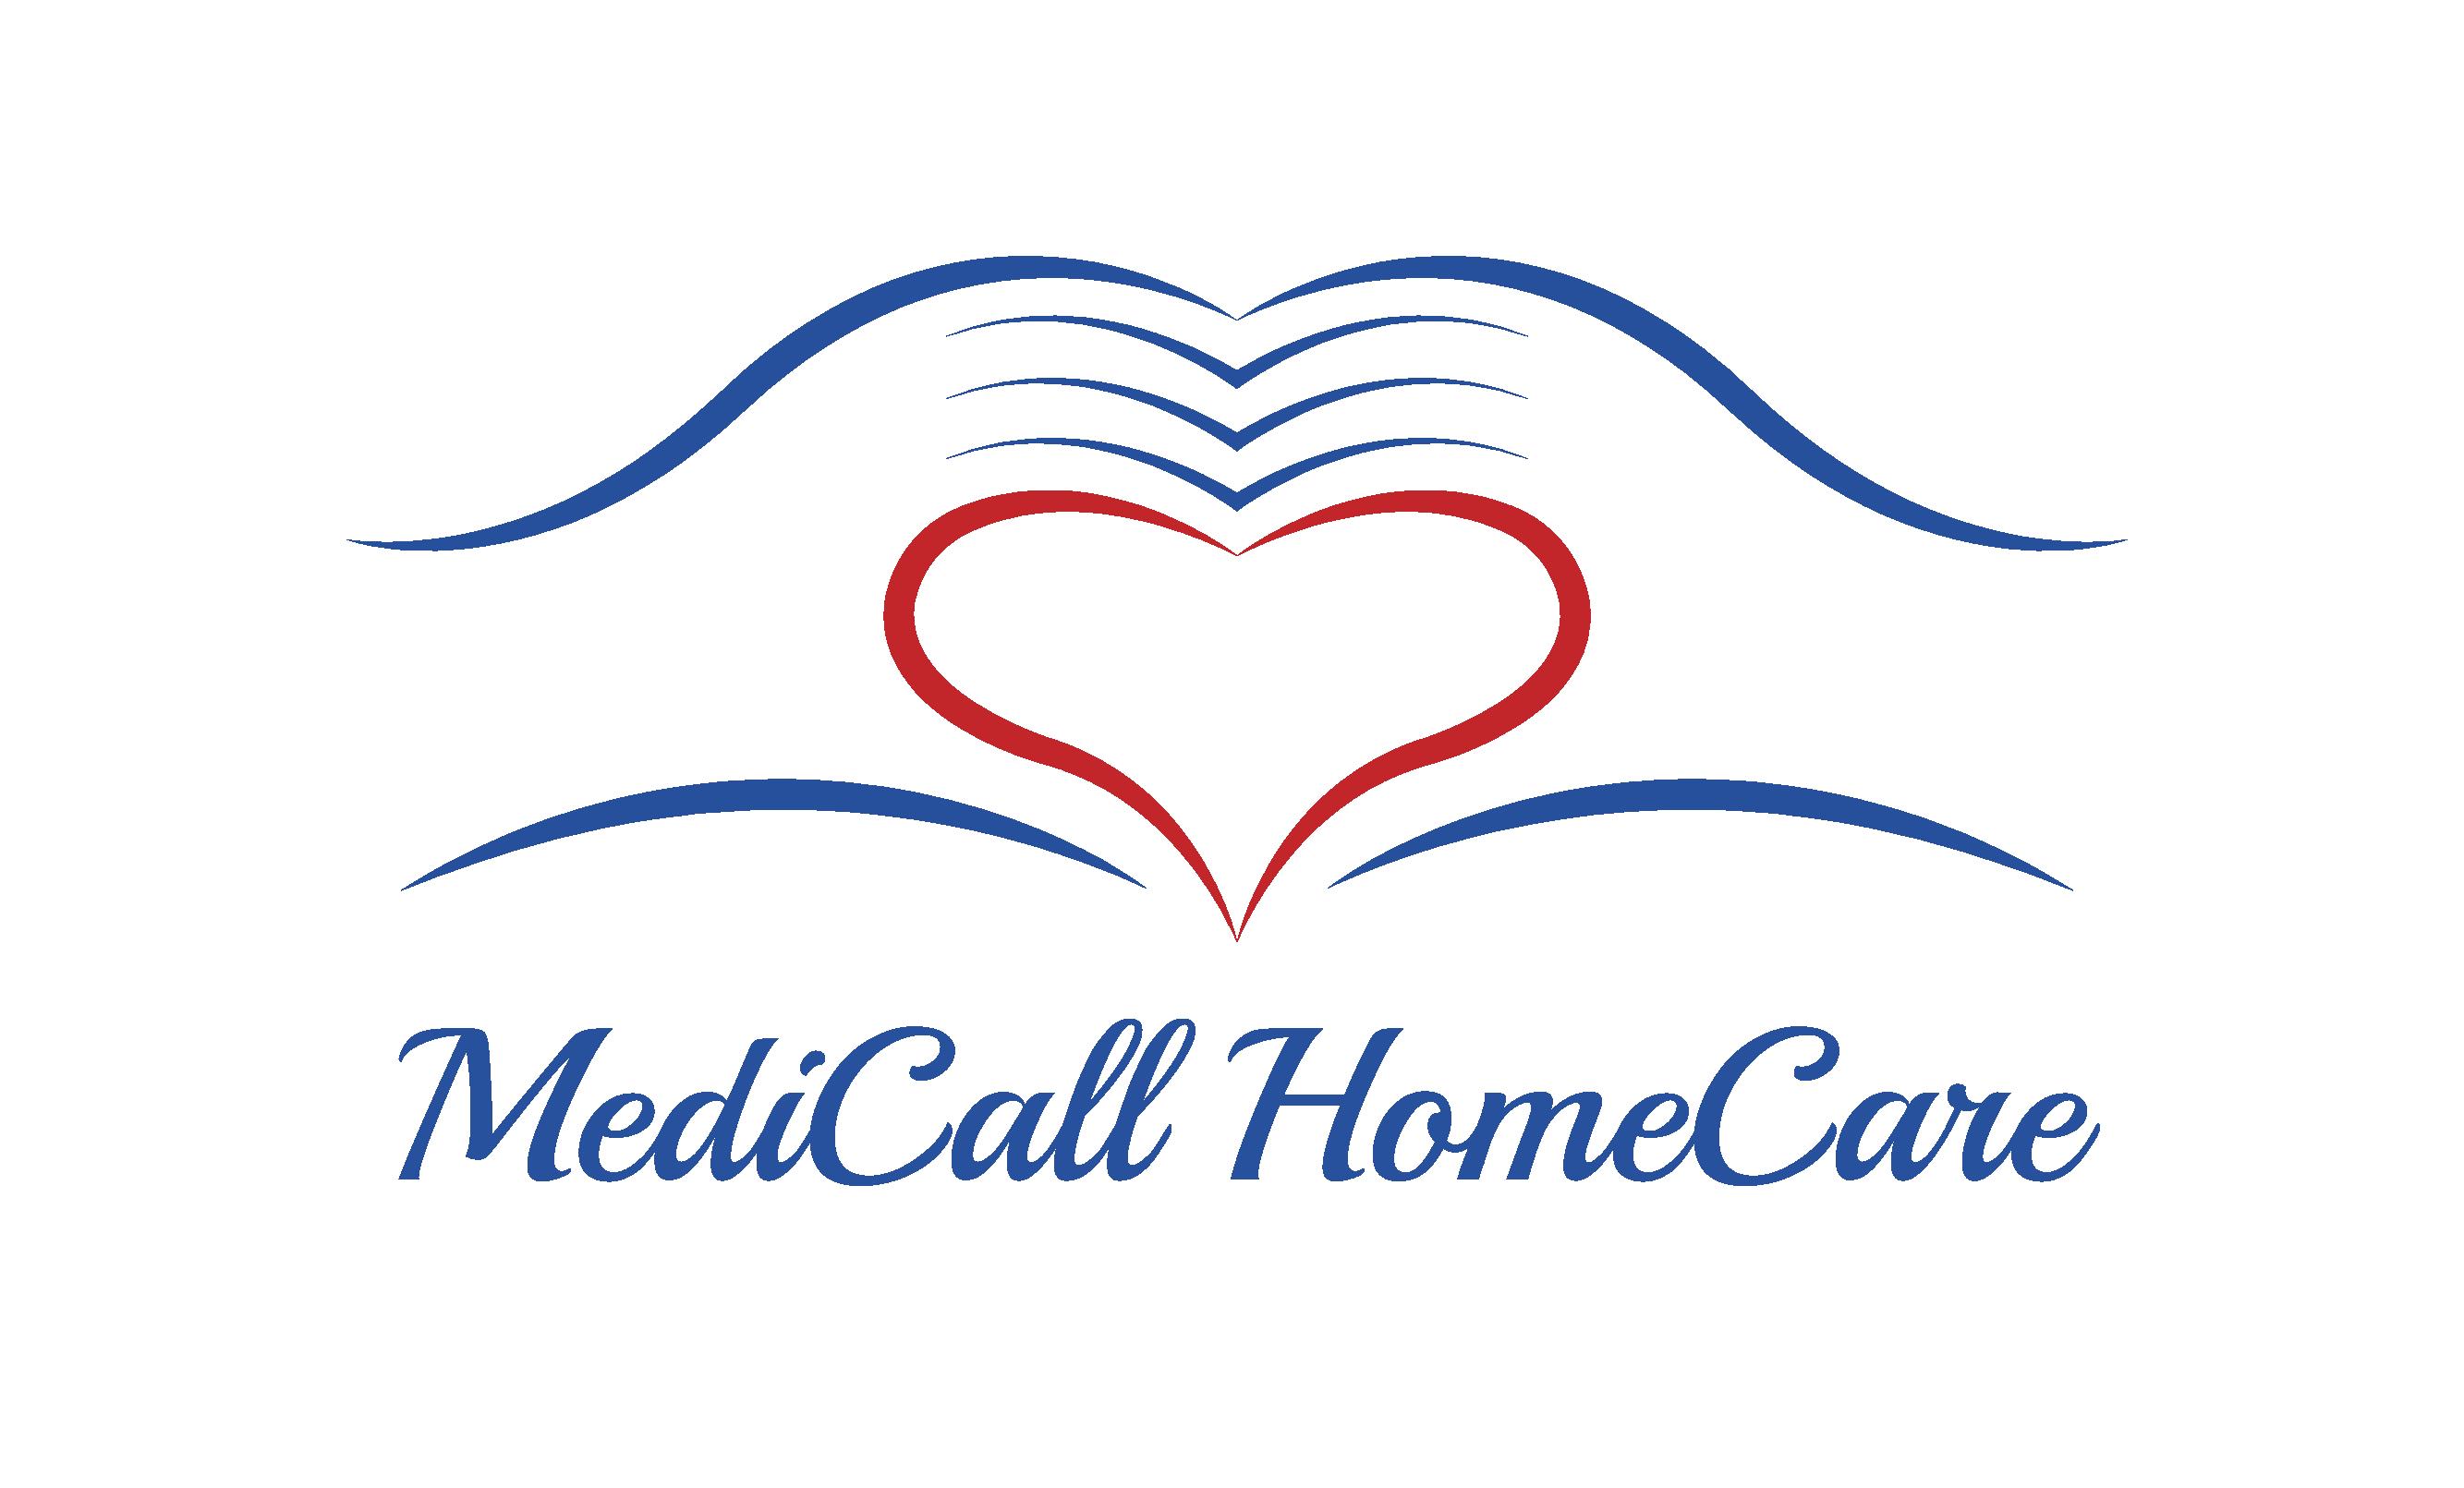 MediCall HomeCare